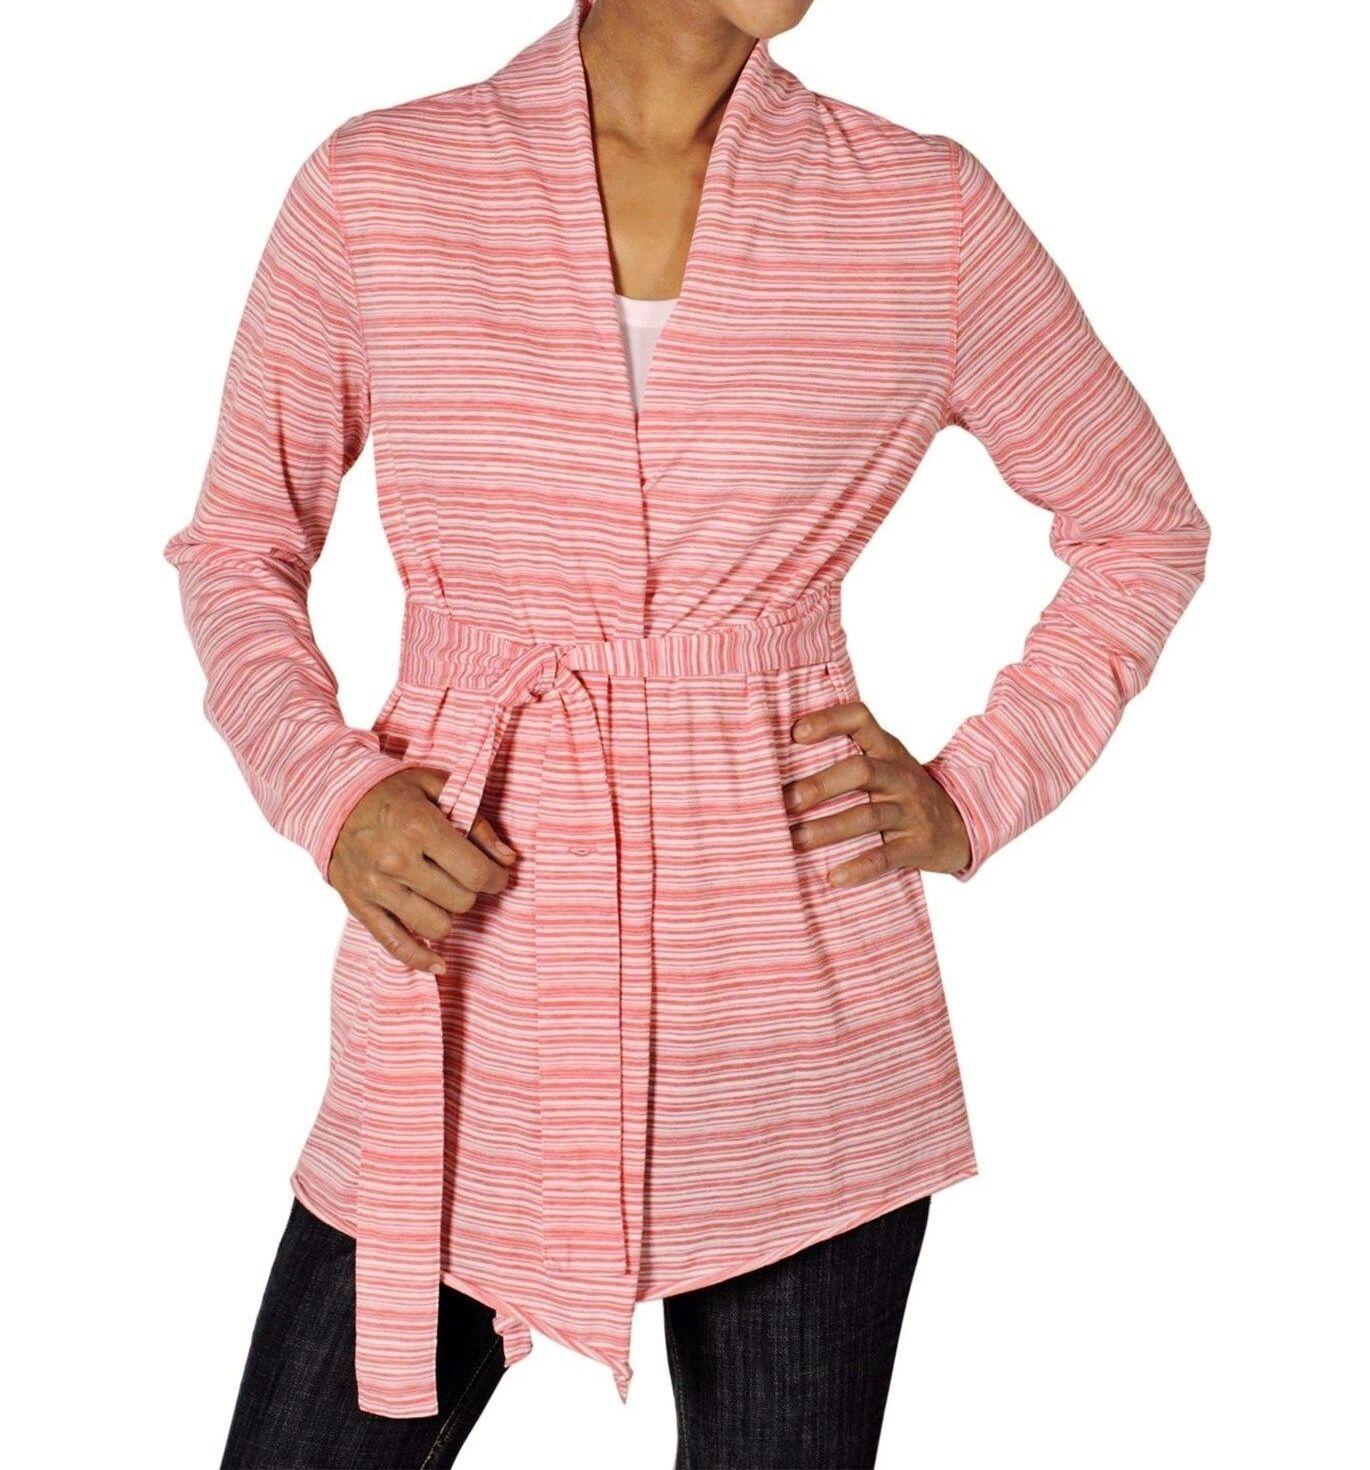 Exofficio Women's L - NWT - Pink Striped Long Sleeve Waist Tie Wrap Cardigan